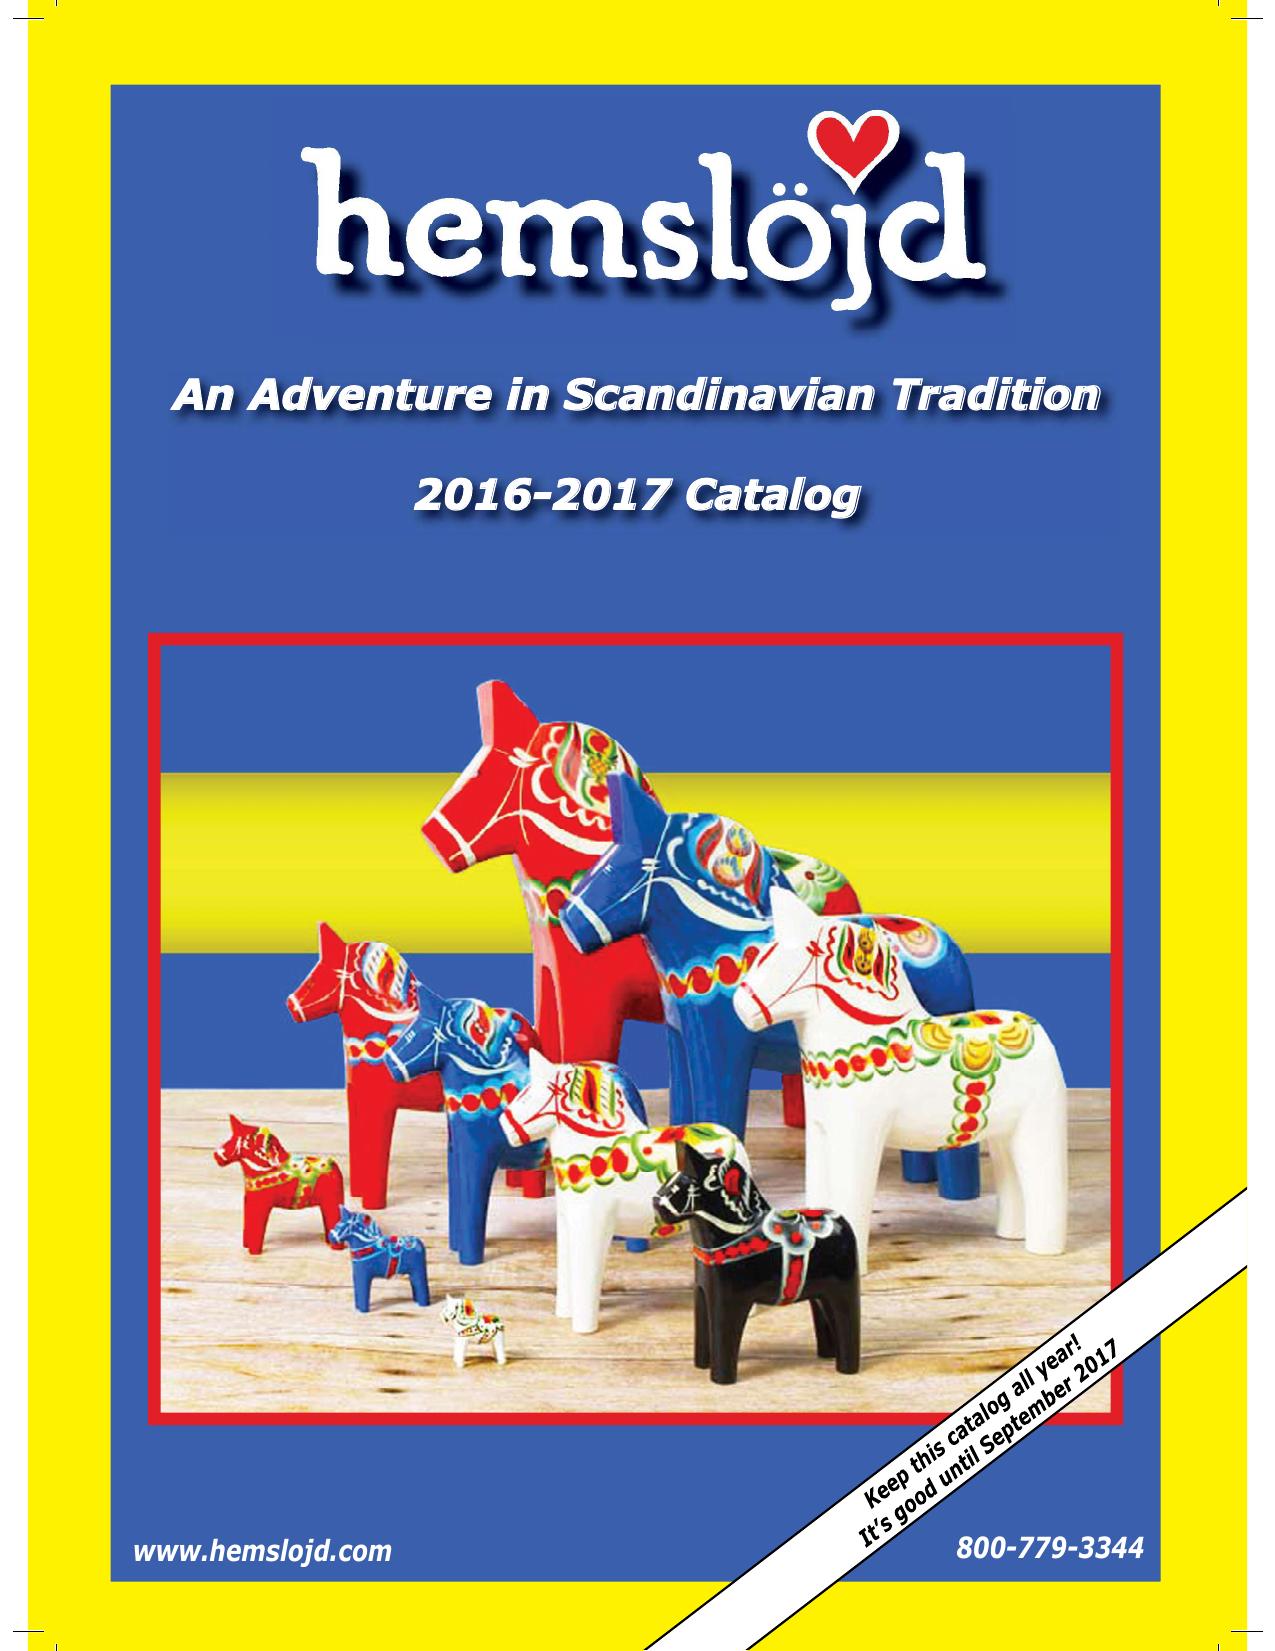 Ceramic Cork Backed Tile Trivet Hot Pad Norway Tile with Norwegian Cities #2457